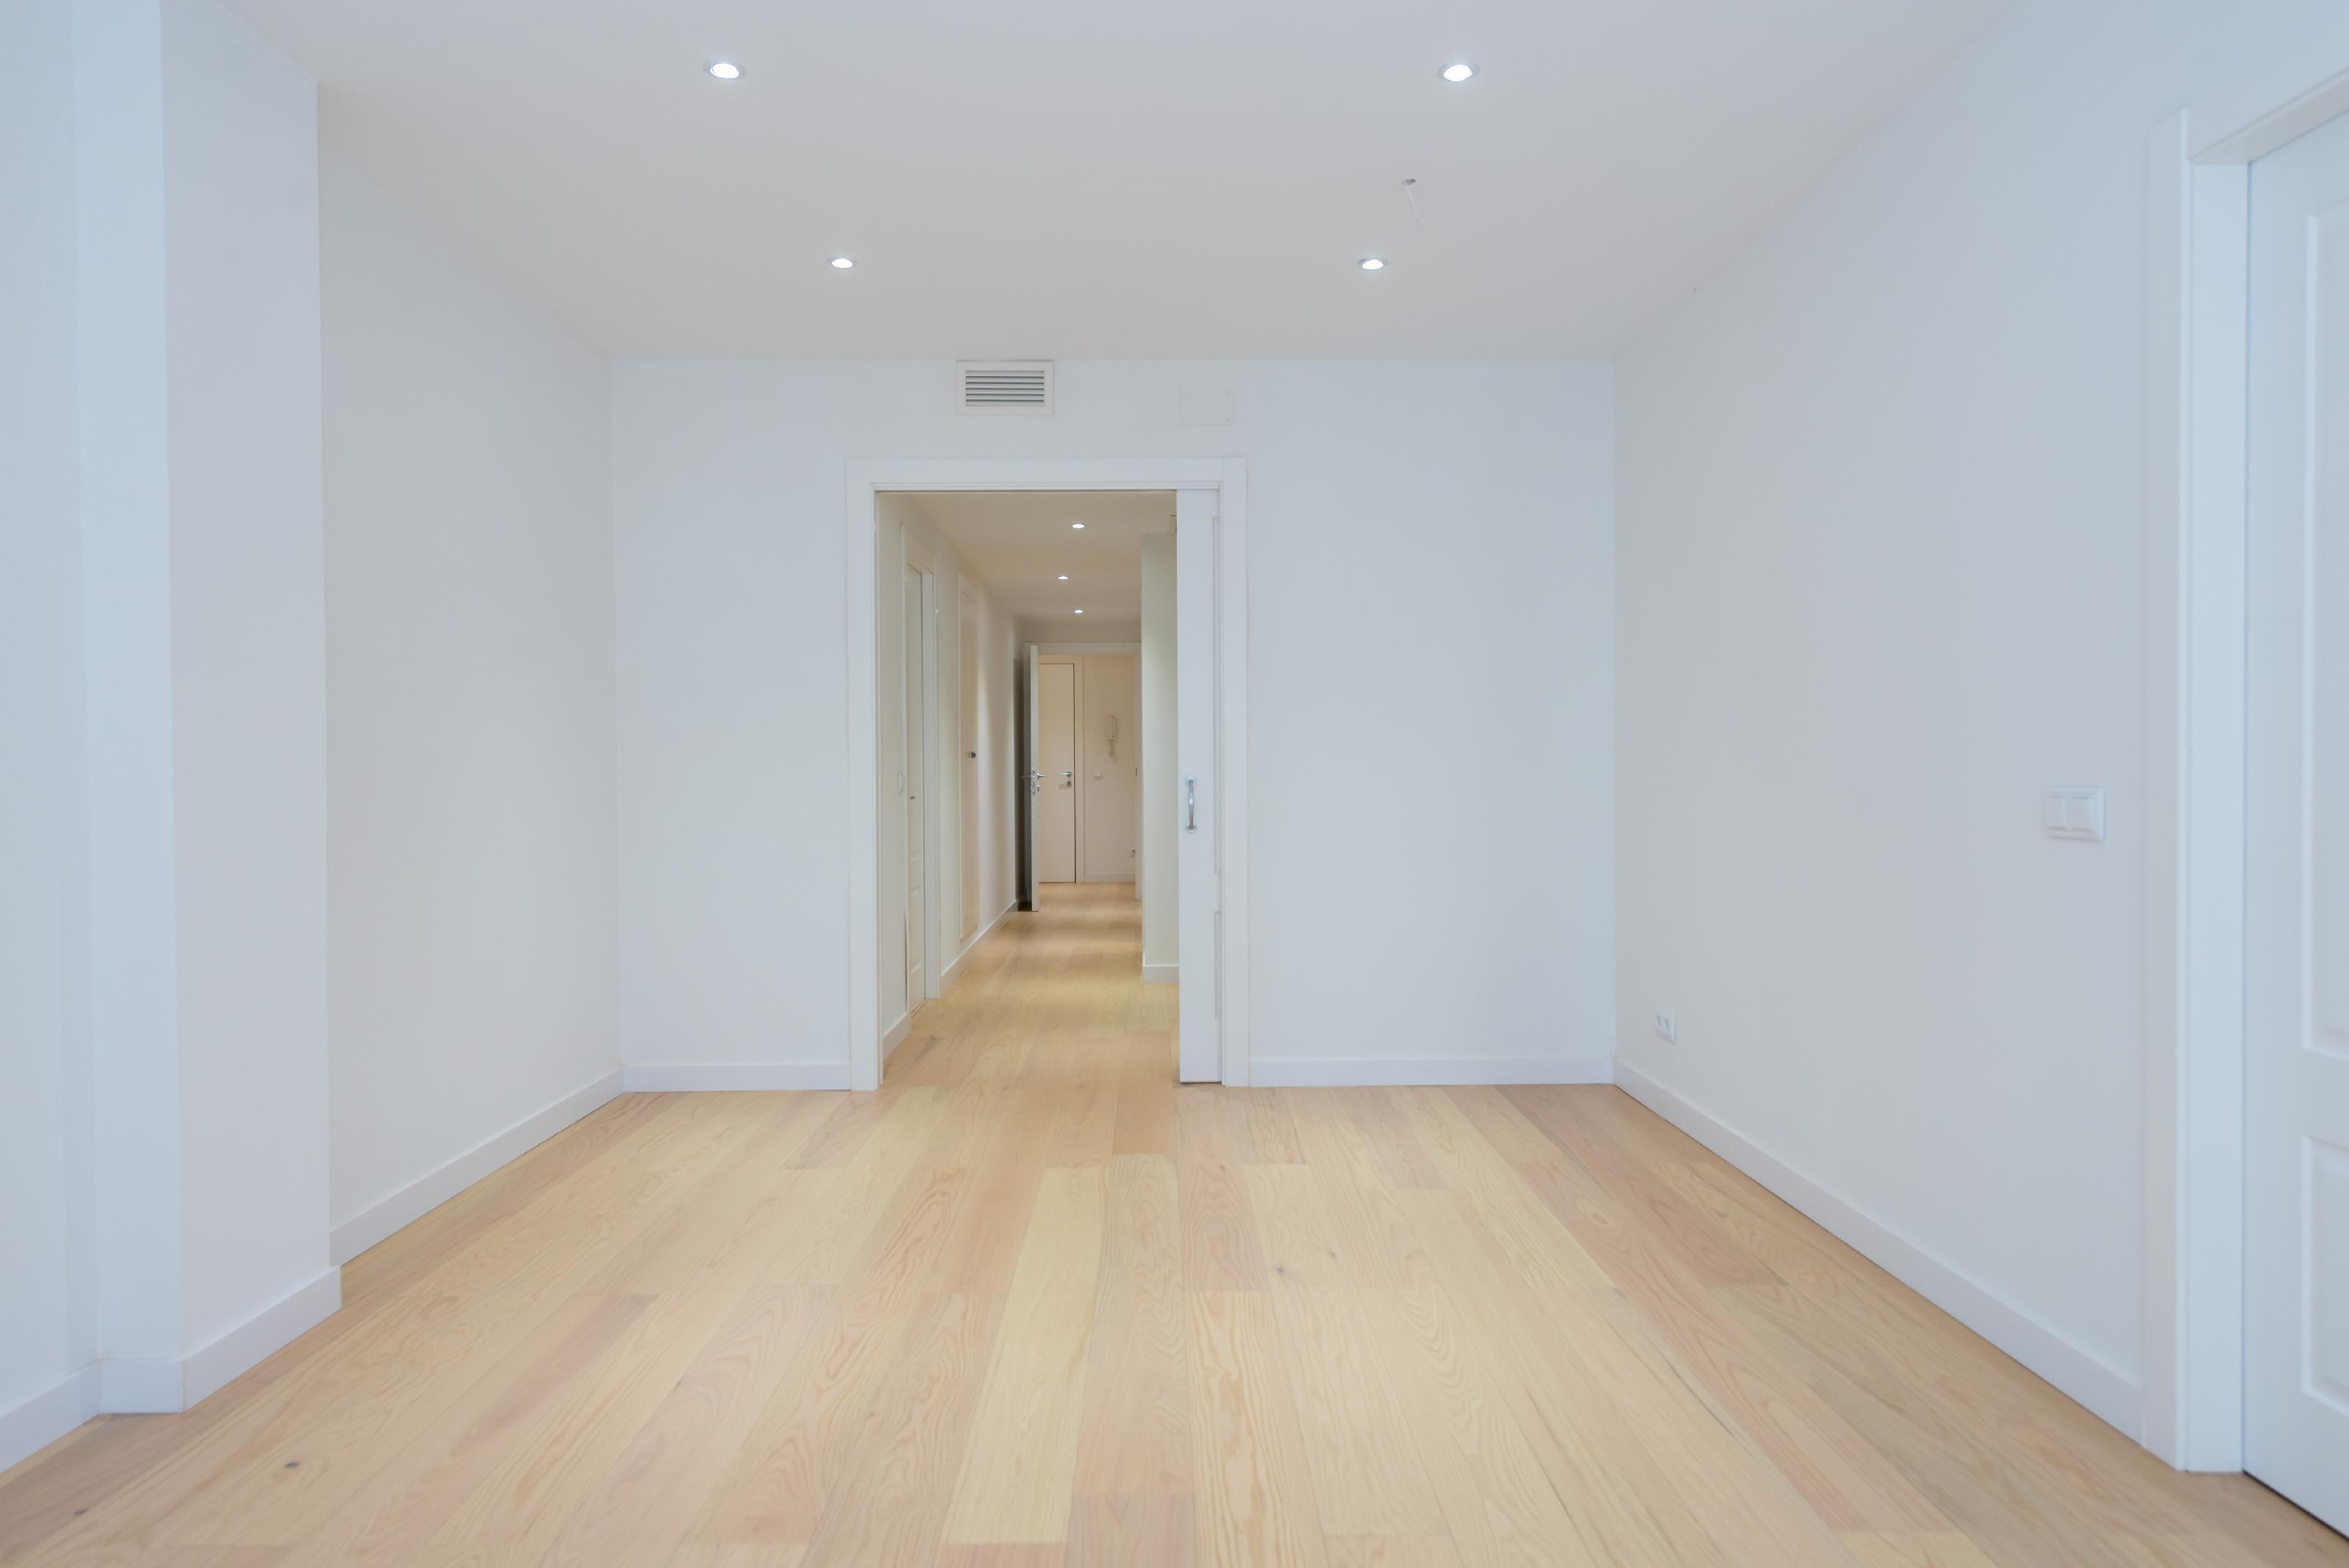 245231 Flat for sale in Sarrià-Sant Gervasi, Sant Gervasi-Galvany 8